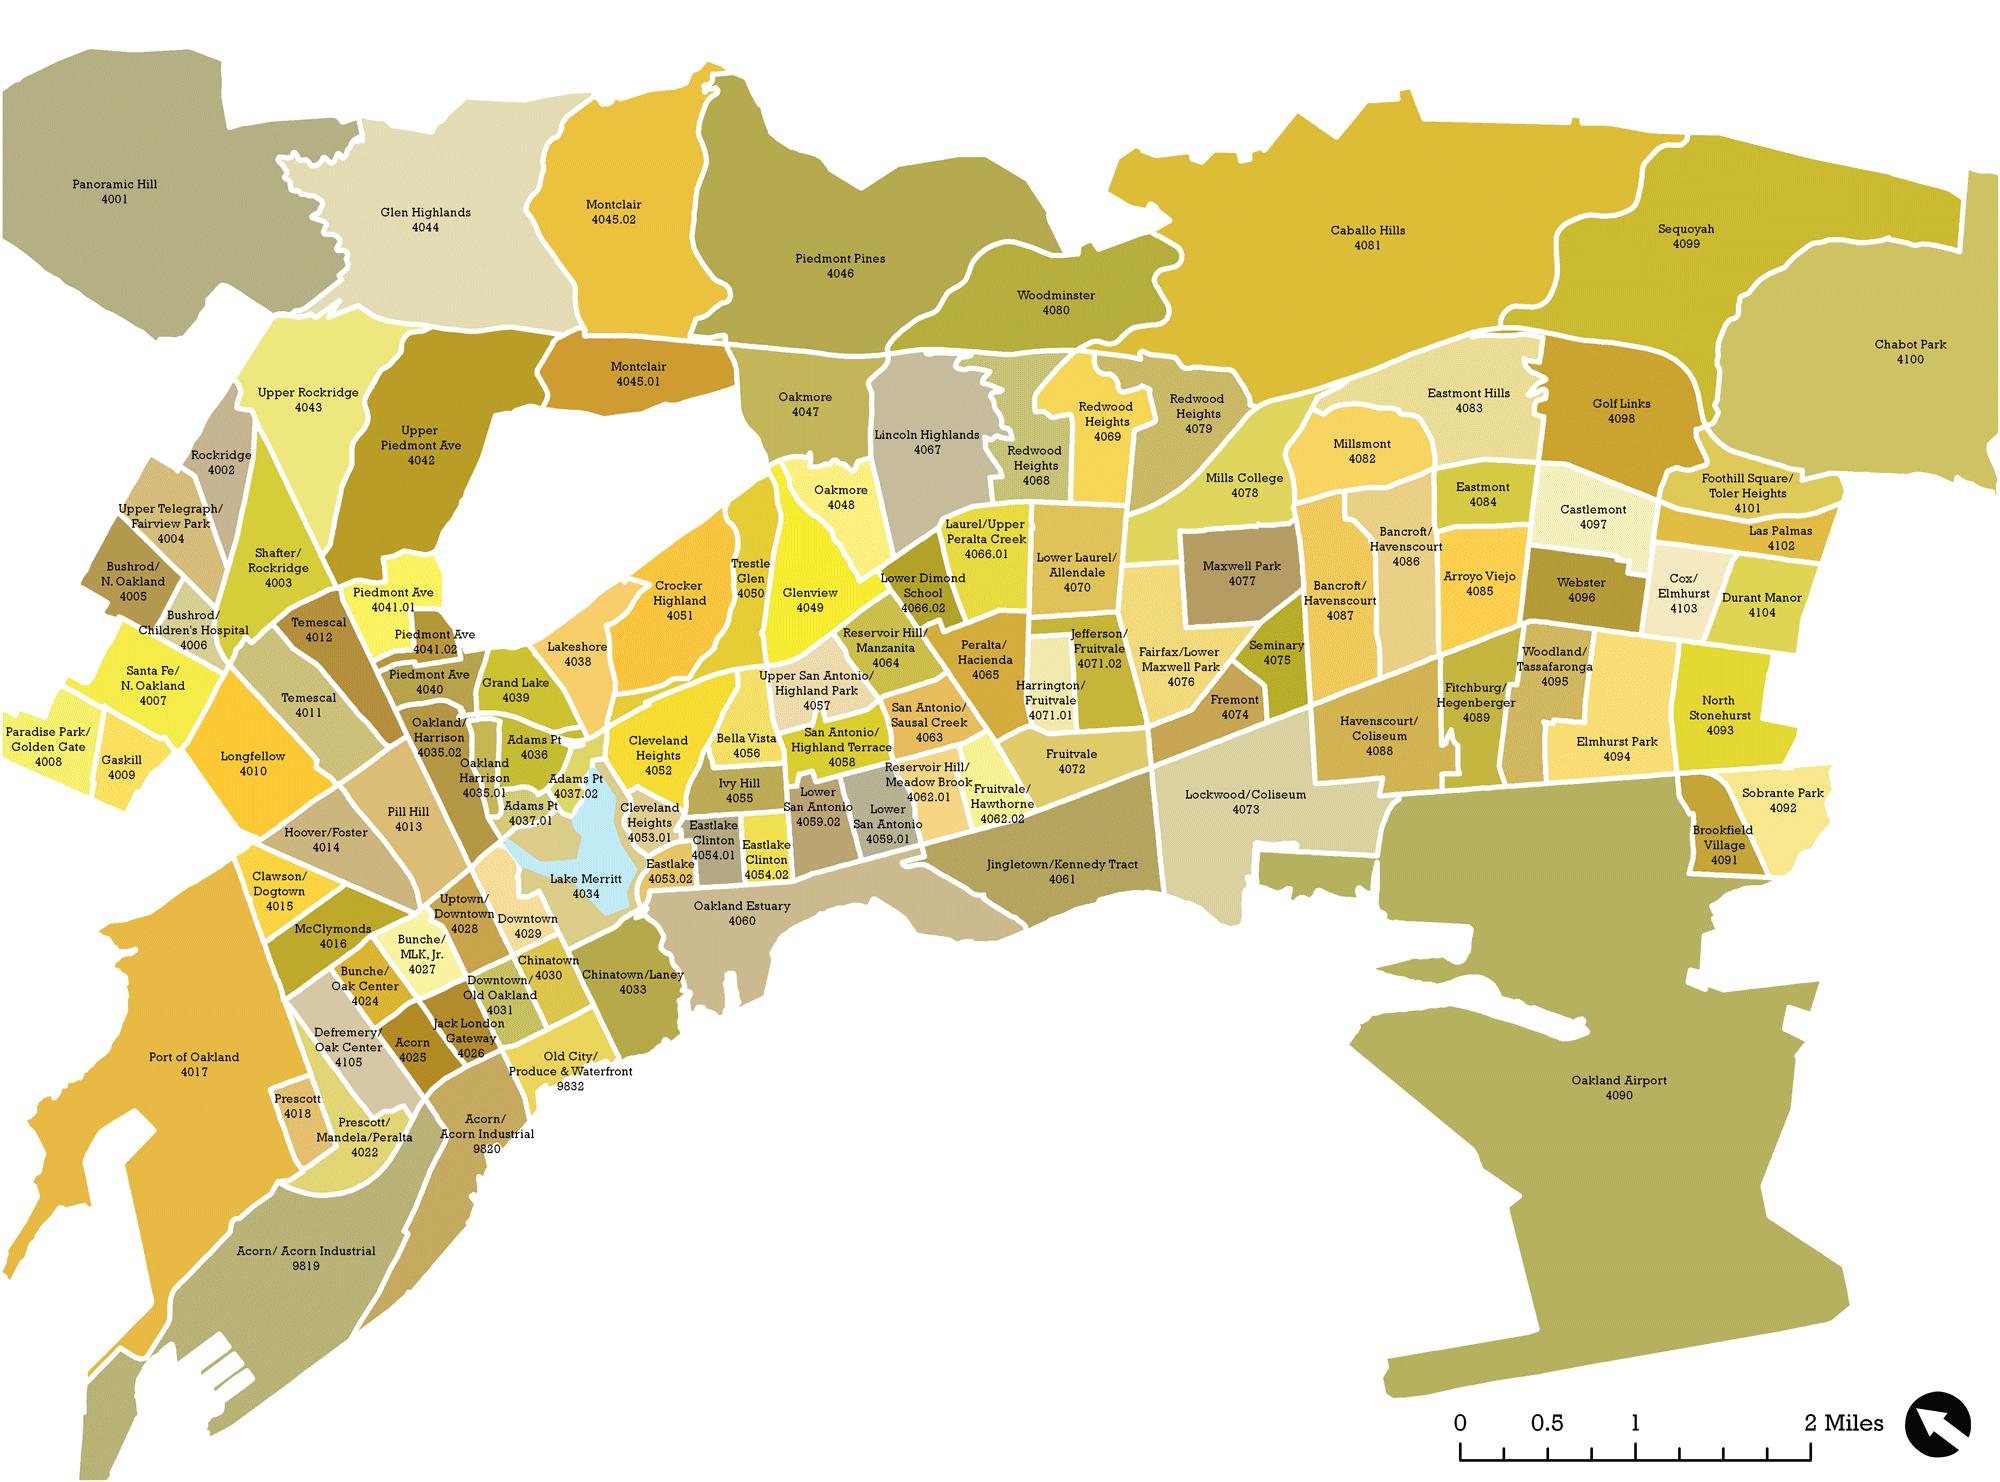 Oakland California Neighborhood Map - Google Search | Hood Maps In - Oakland California Map